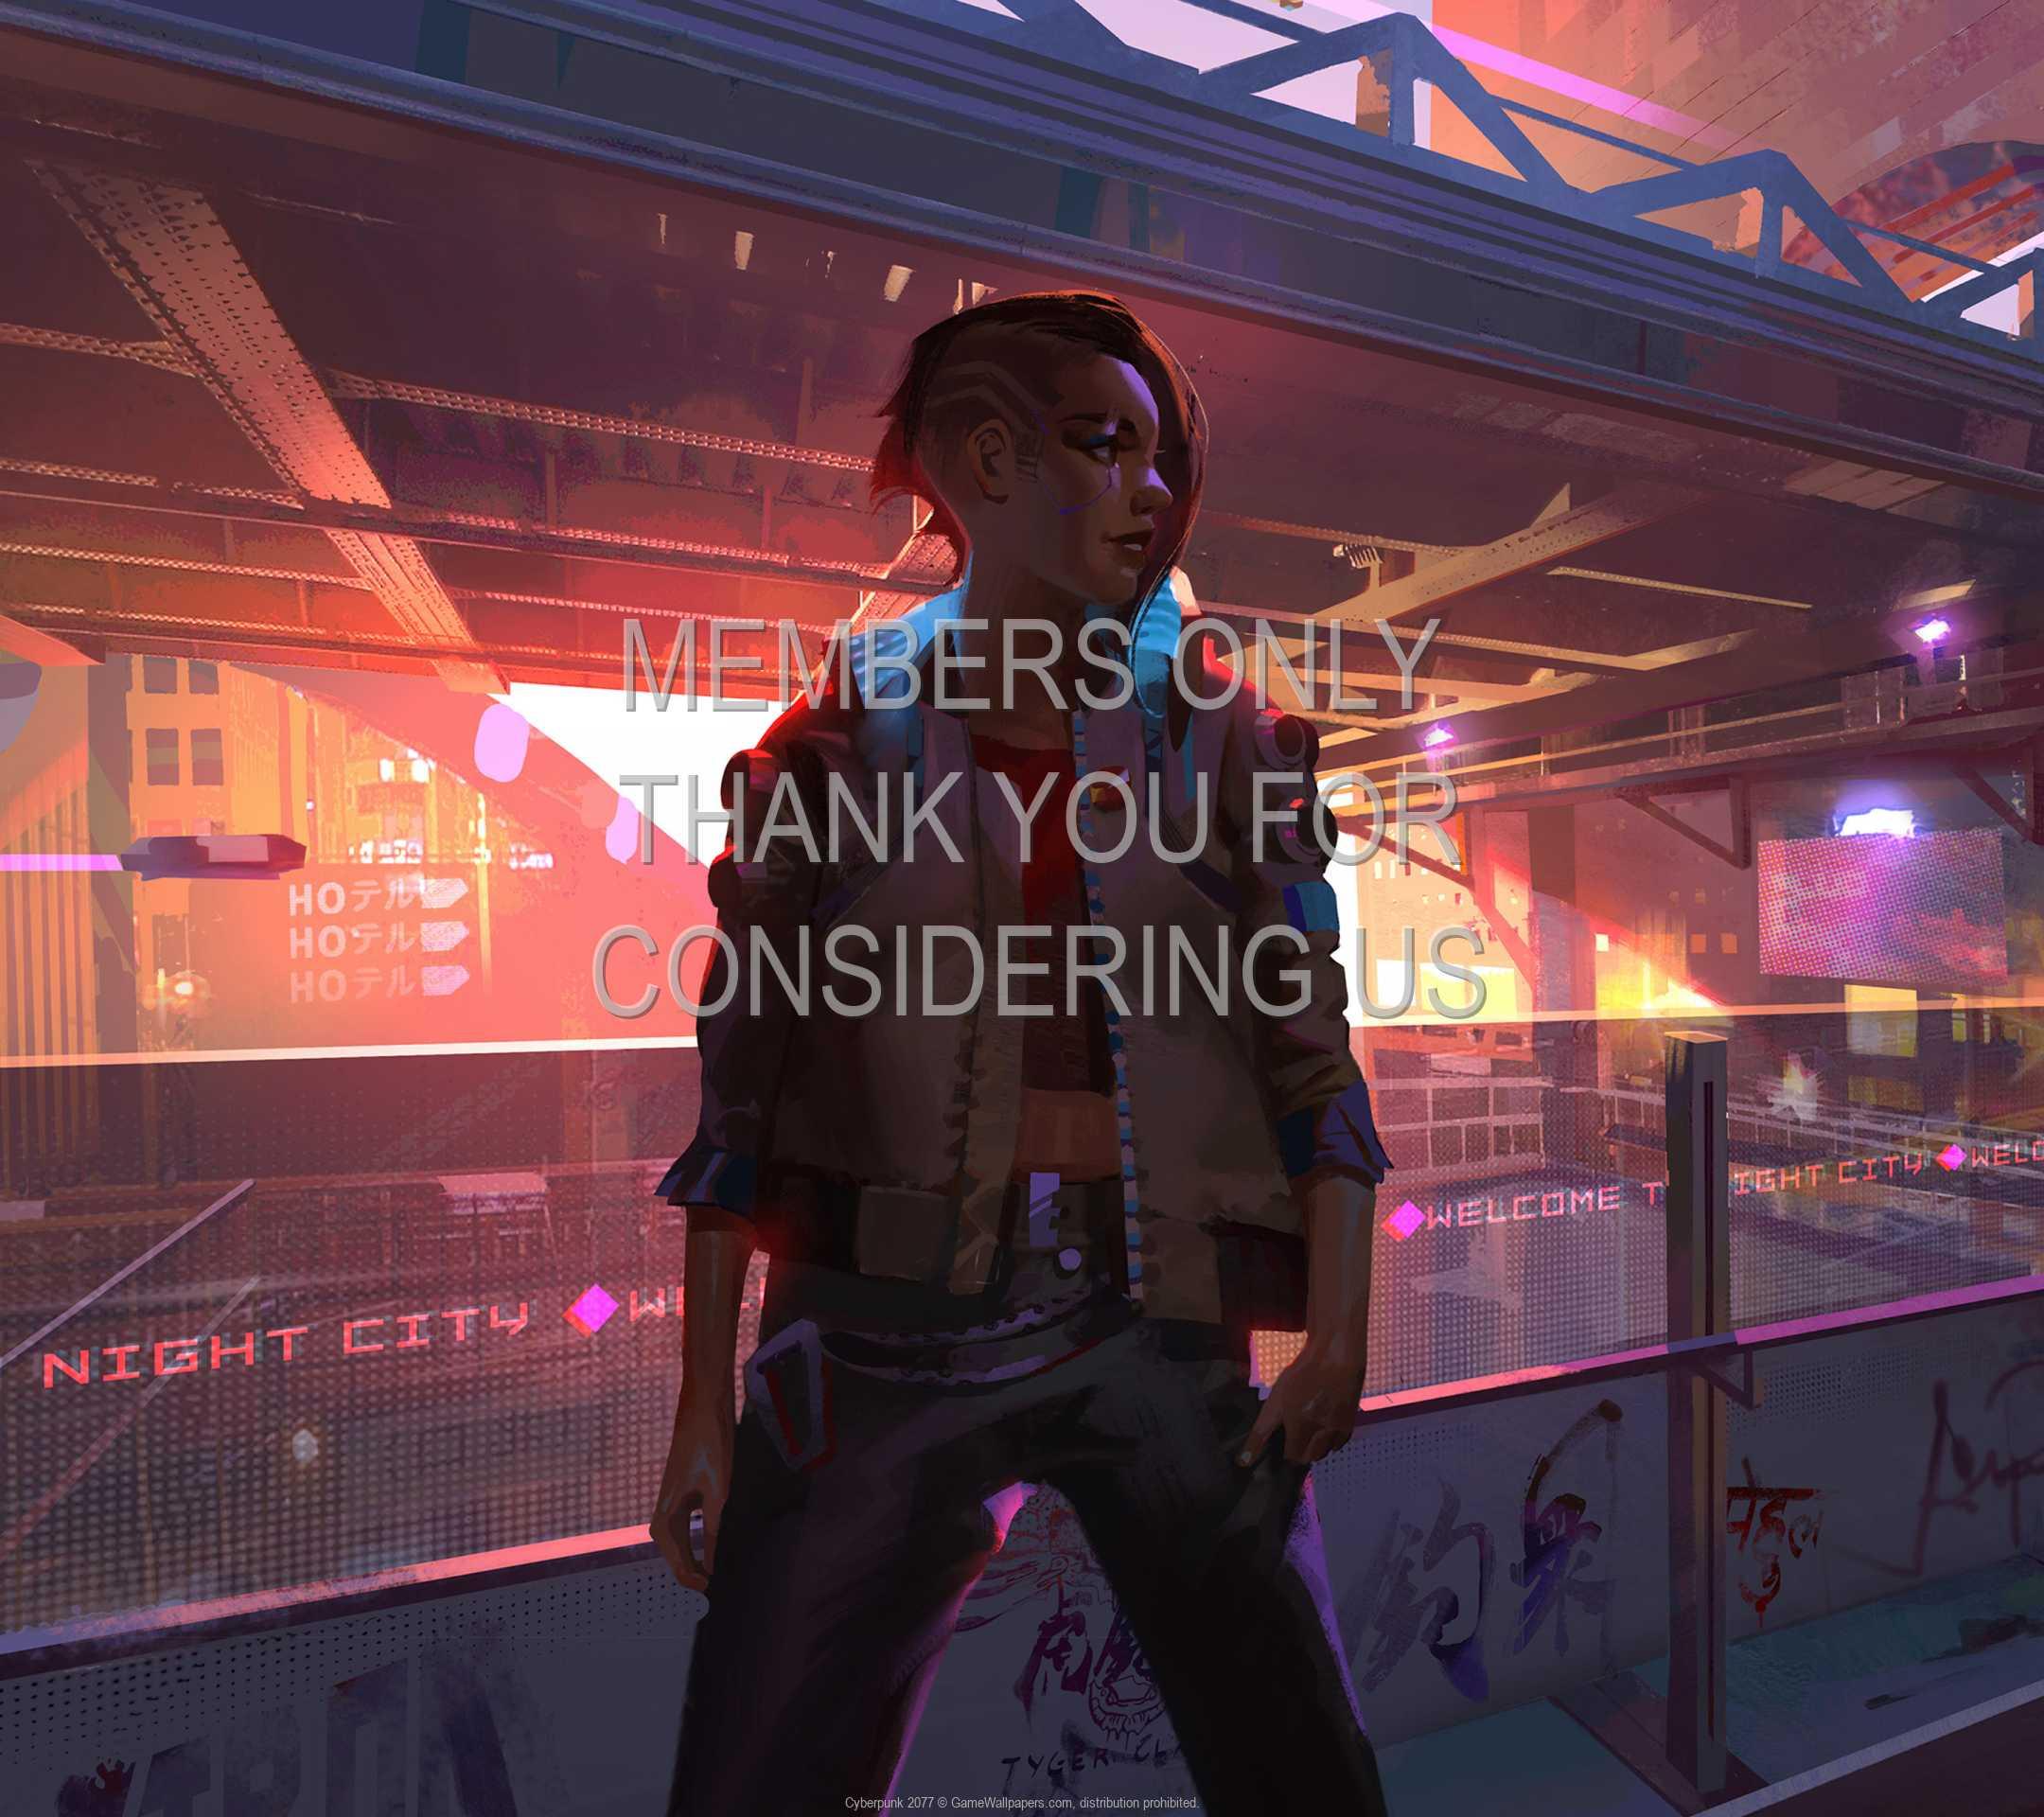 Cyberpunk 2077 1080p Horizontal Mobile fond d'écran 40